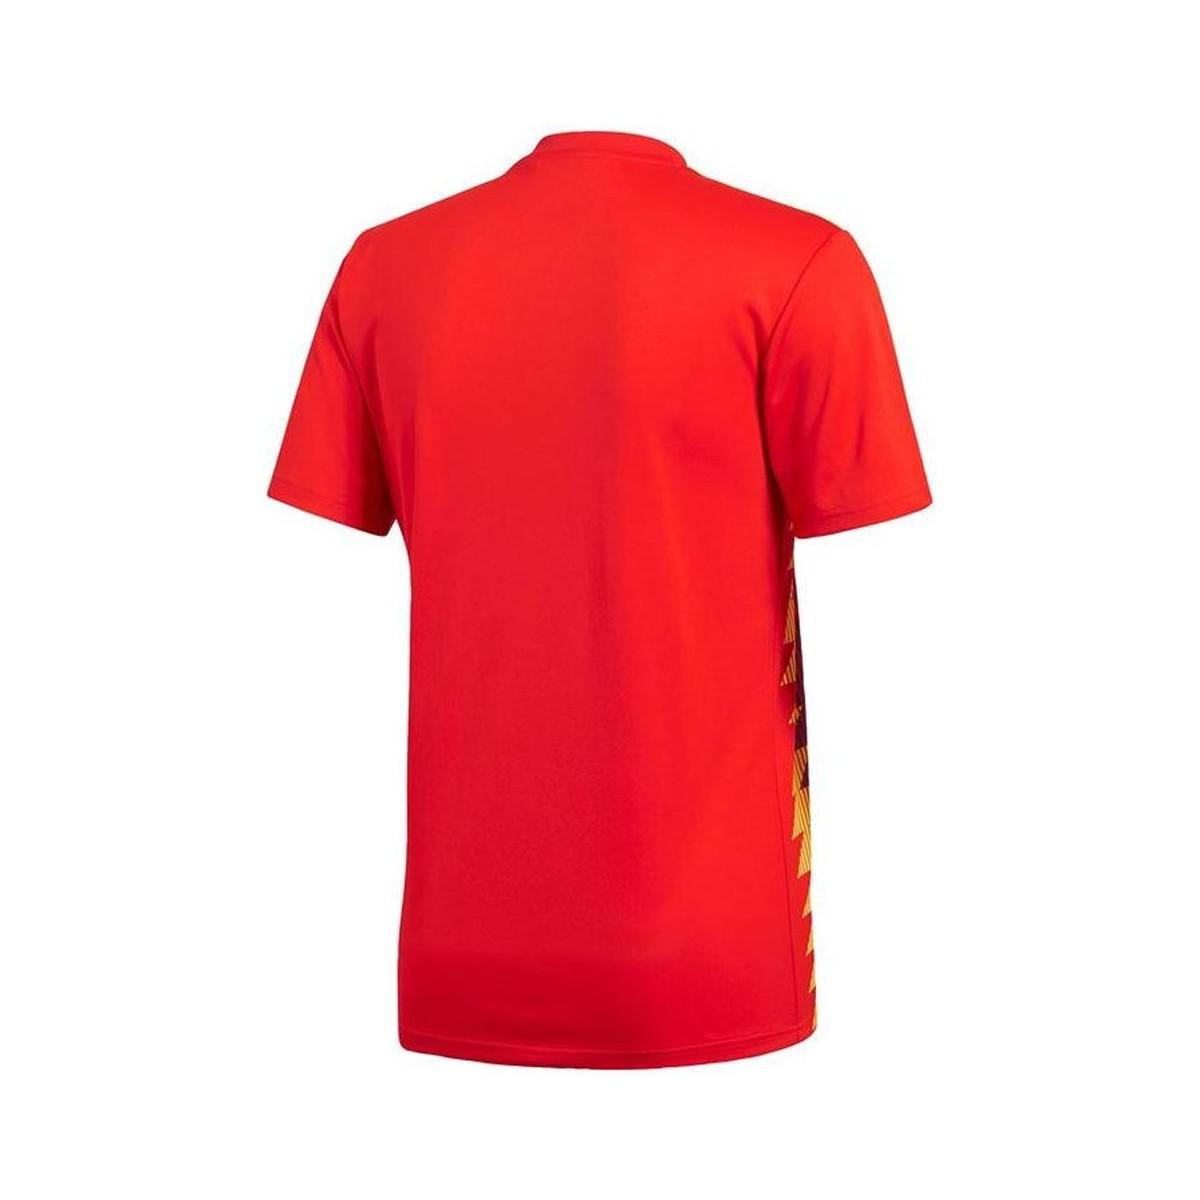 Adidas - 2018-19 Spain Home Shirt (puyol 5) Women s T Shirt In. View  fullscreen 4c27a1442